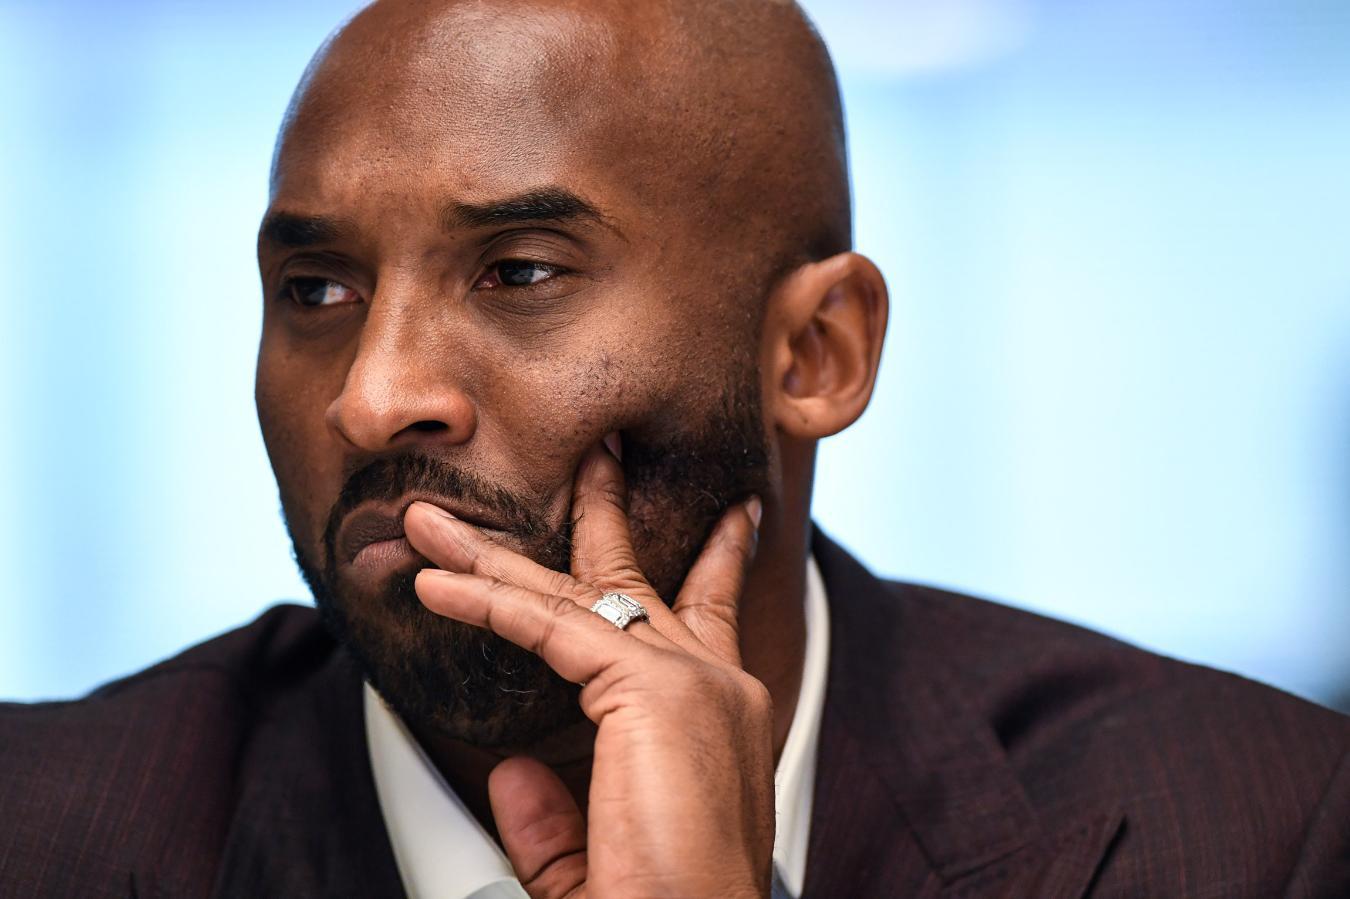 O Κόμπι Μπράιαντ θα δώσει το «παρών» στην κλήρωση του Μουντομπάσκετ